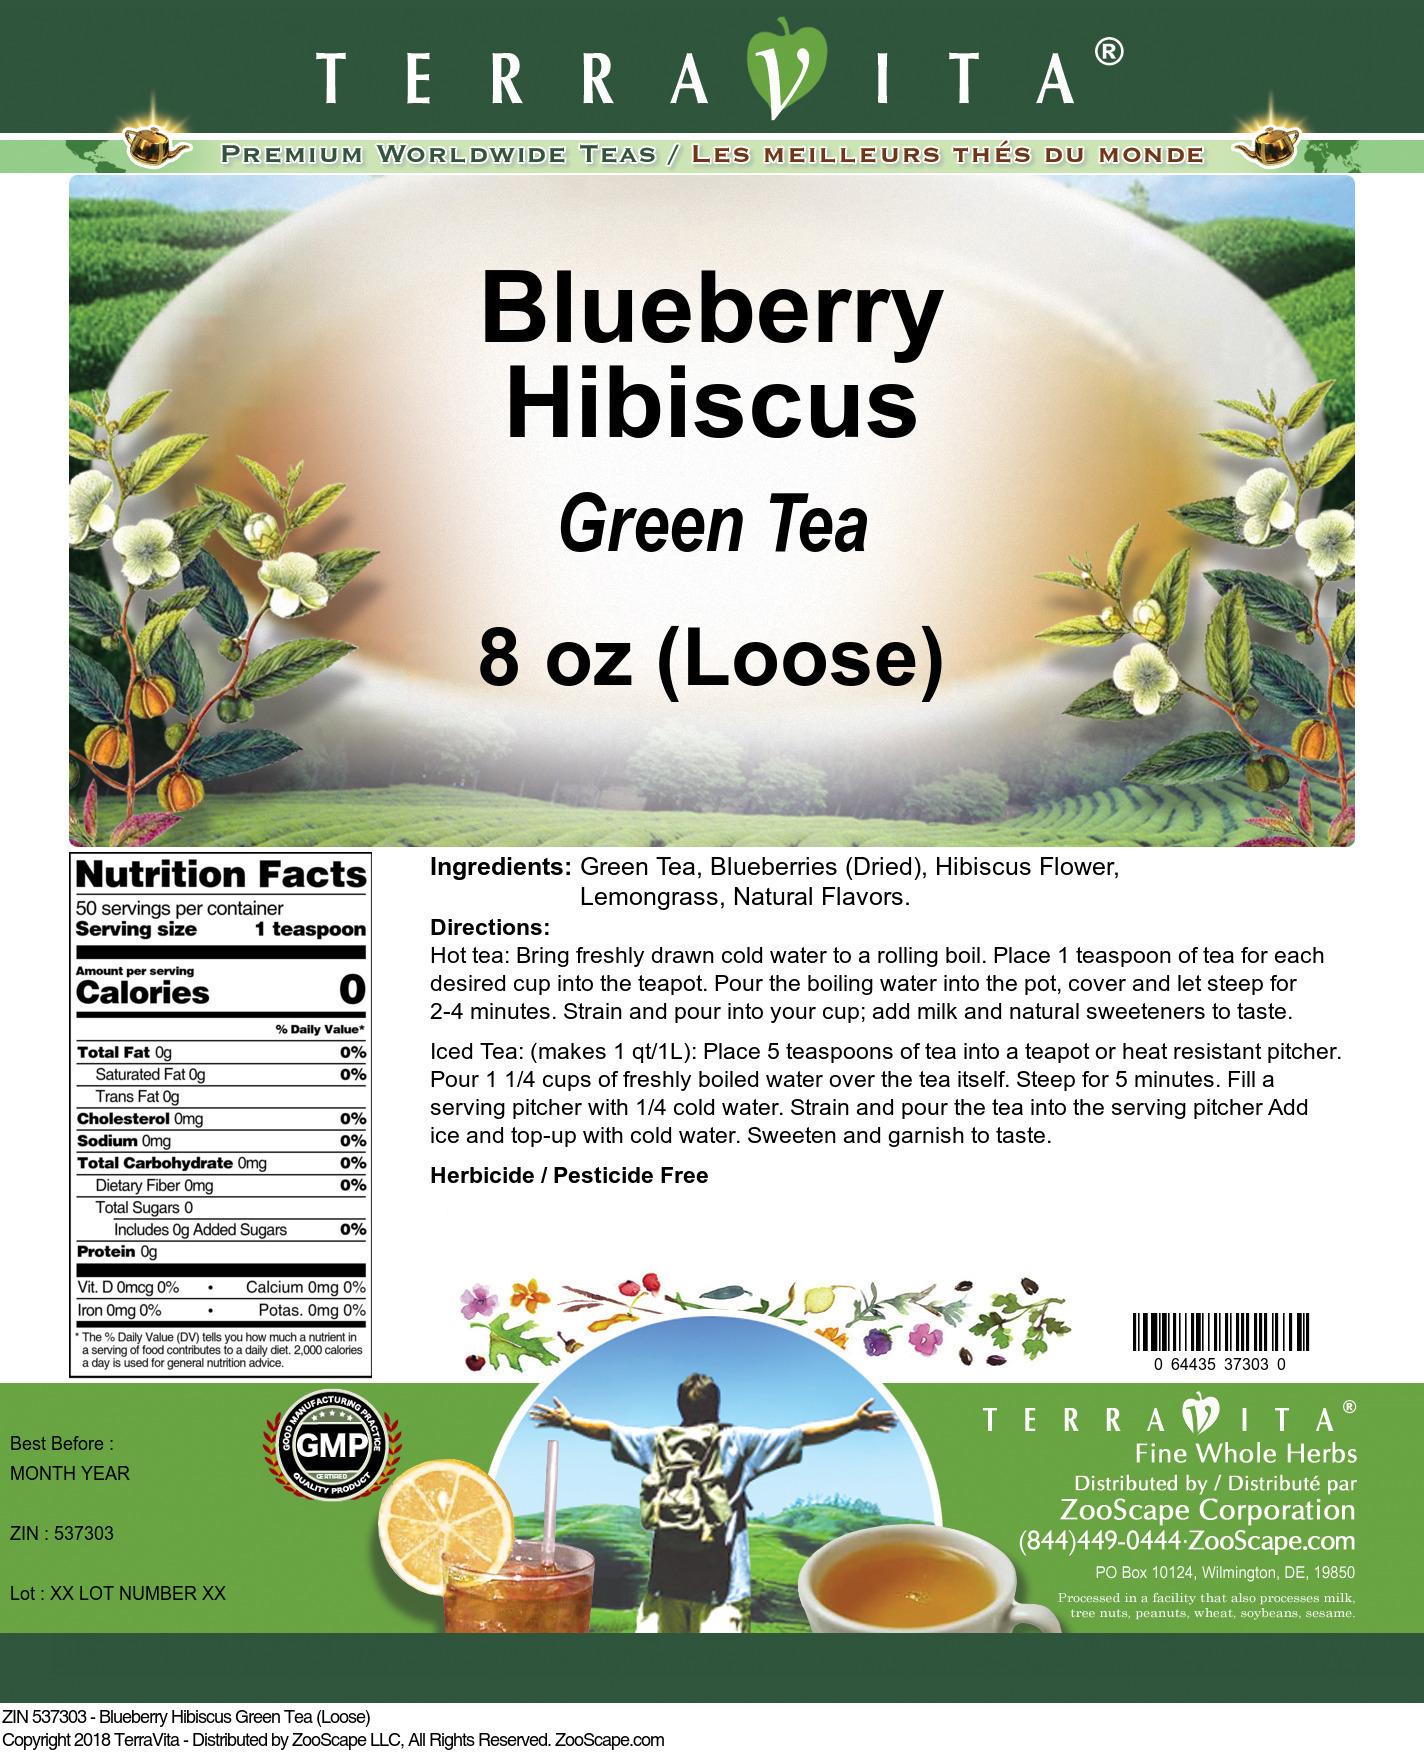 Blueberry Hibiscus Green Tea (Loose)